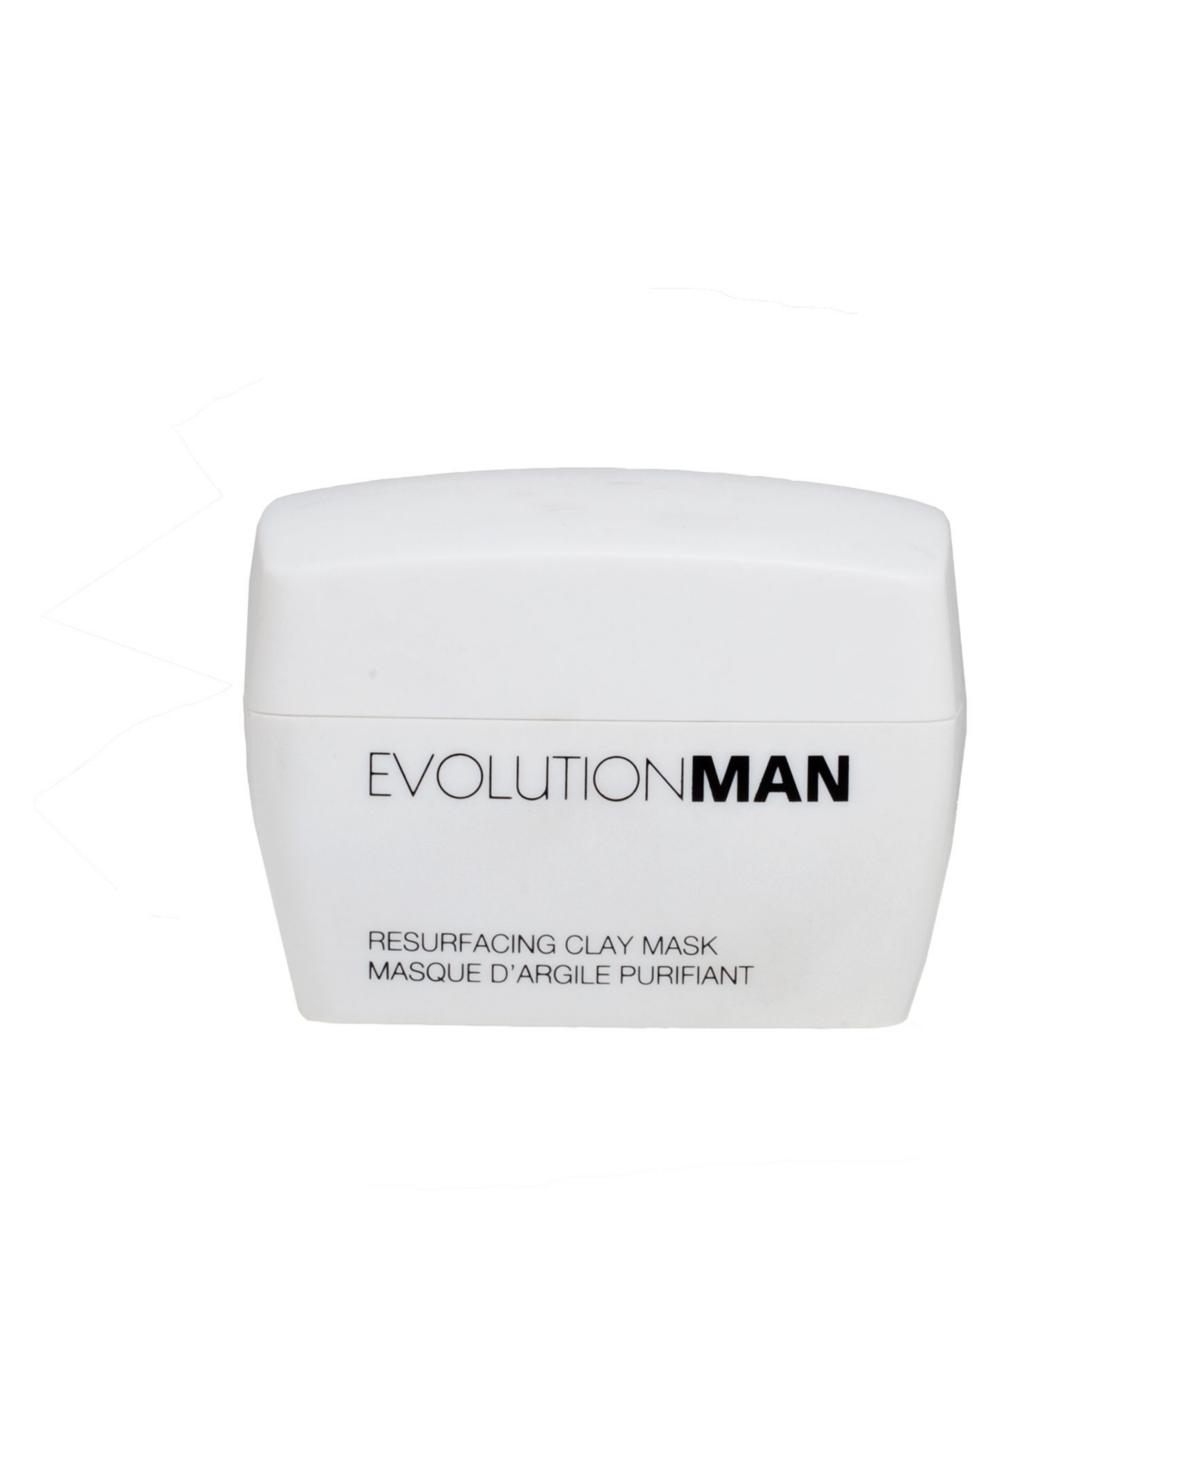 Evolutionman Men's Clay Mask